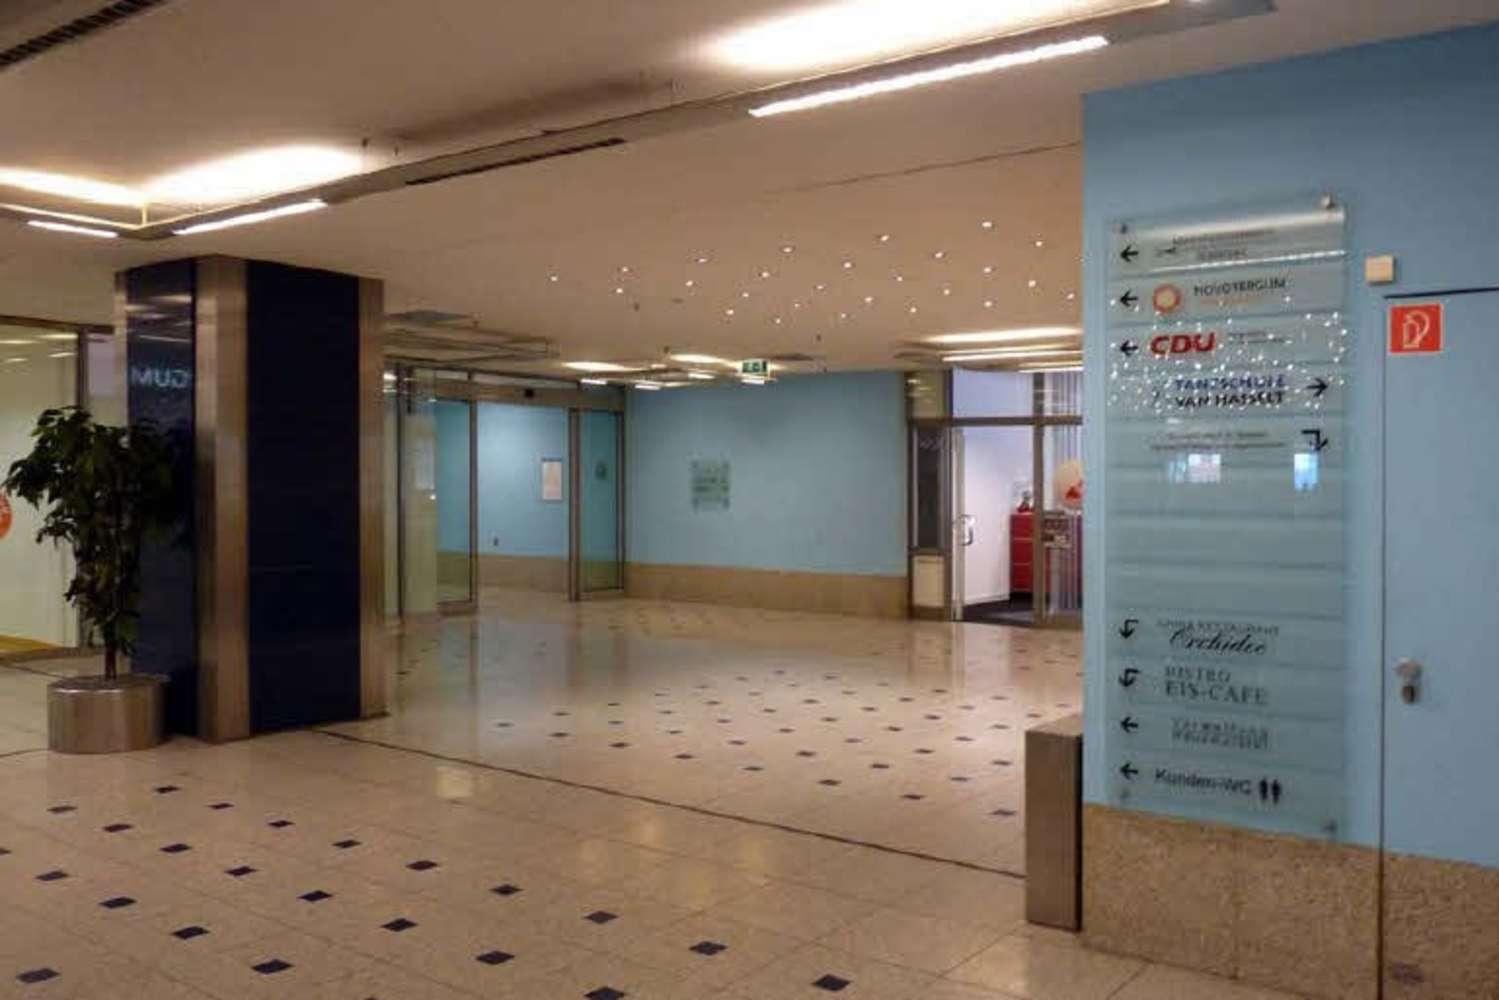 Büros Köln, 50996 - Büro - Köln, Rodenkirchen - K0349 - 9395090